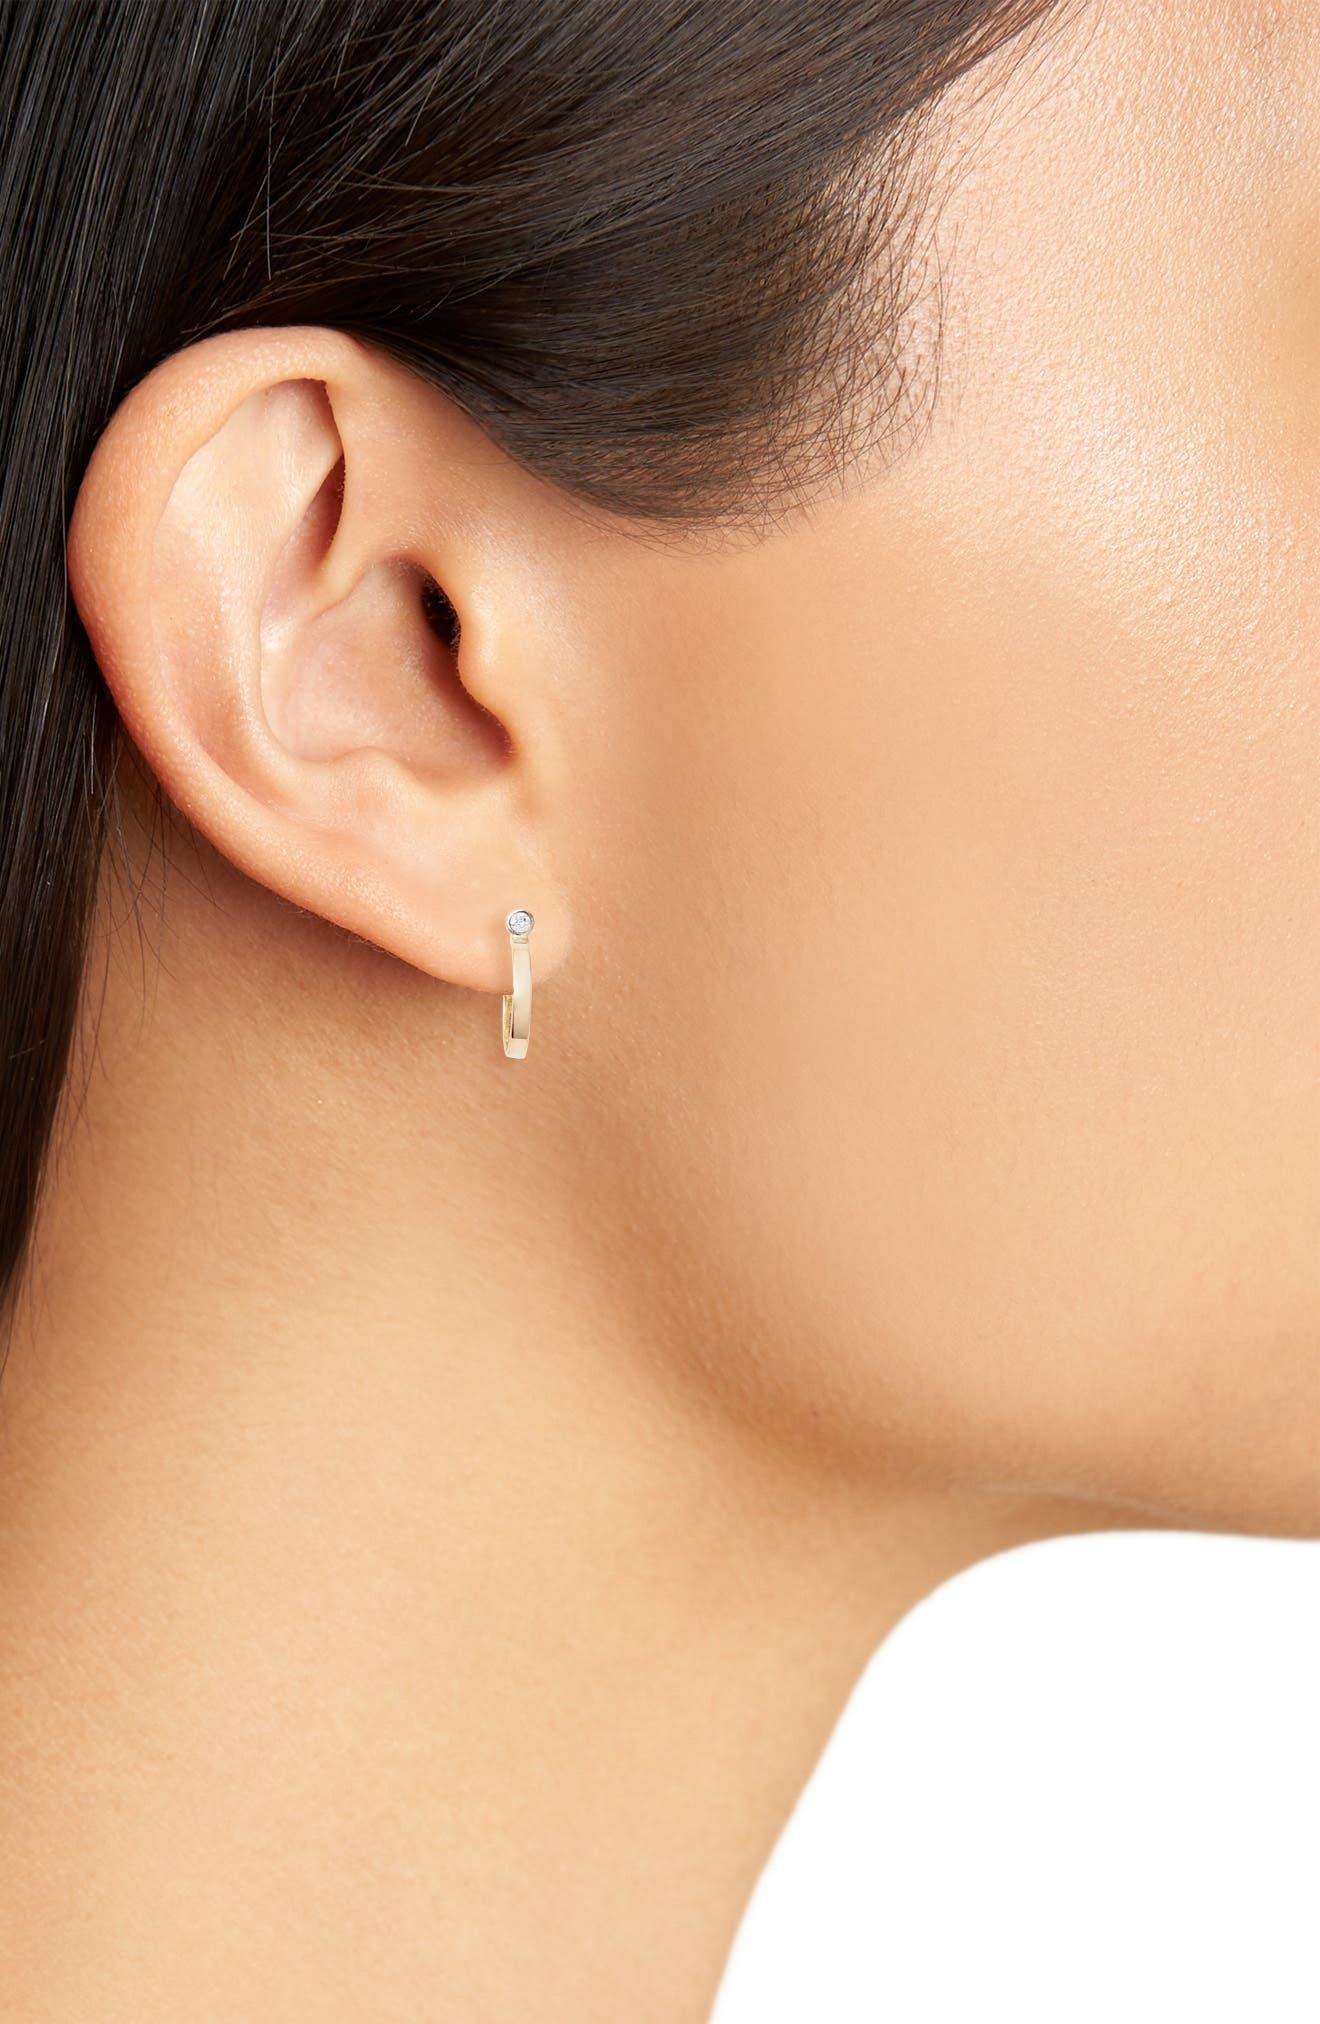 Diamond Hoop Earrings,                             Alternate thumbnail 2, color,                             710